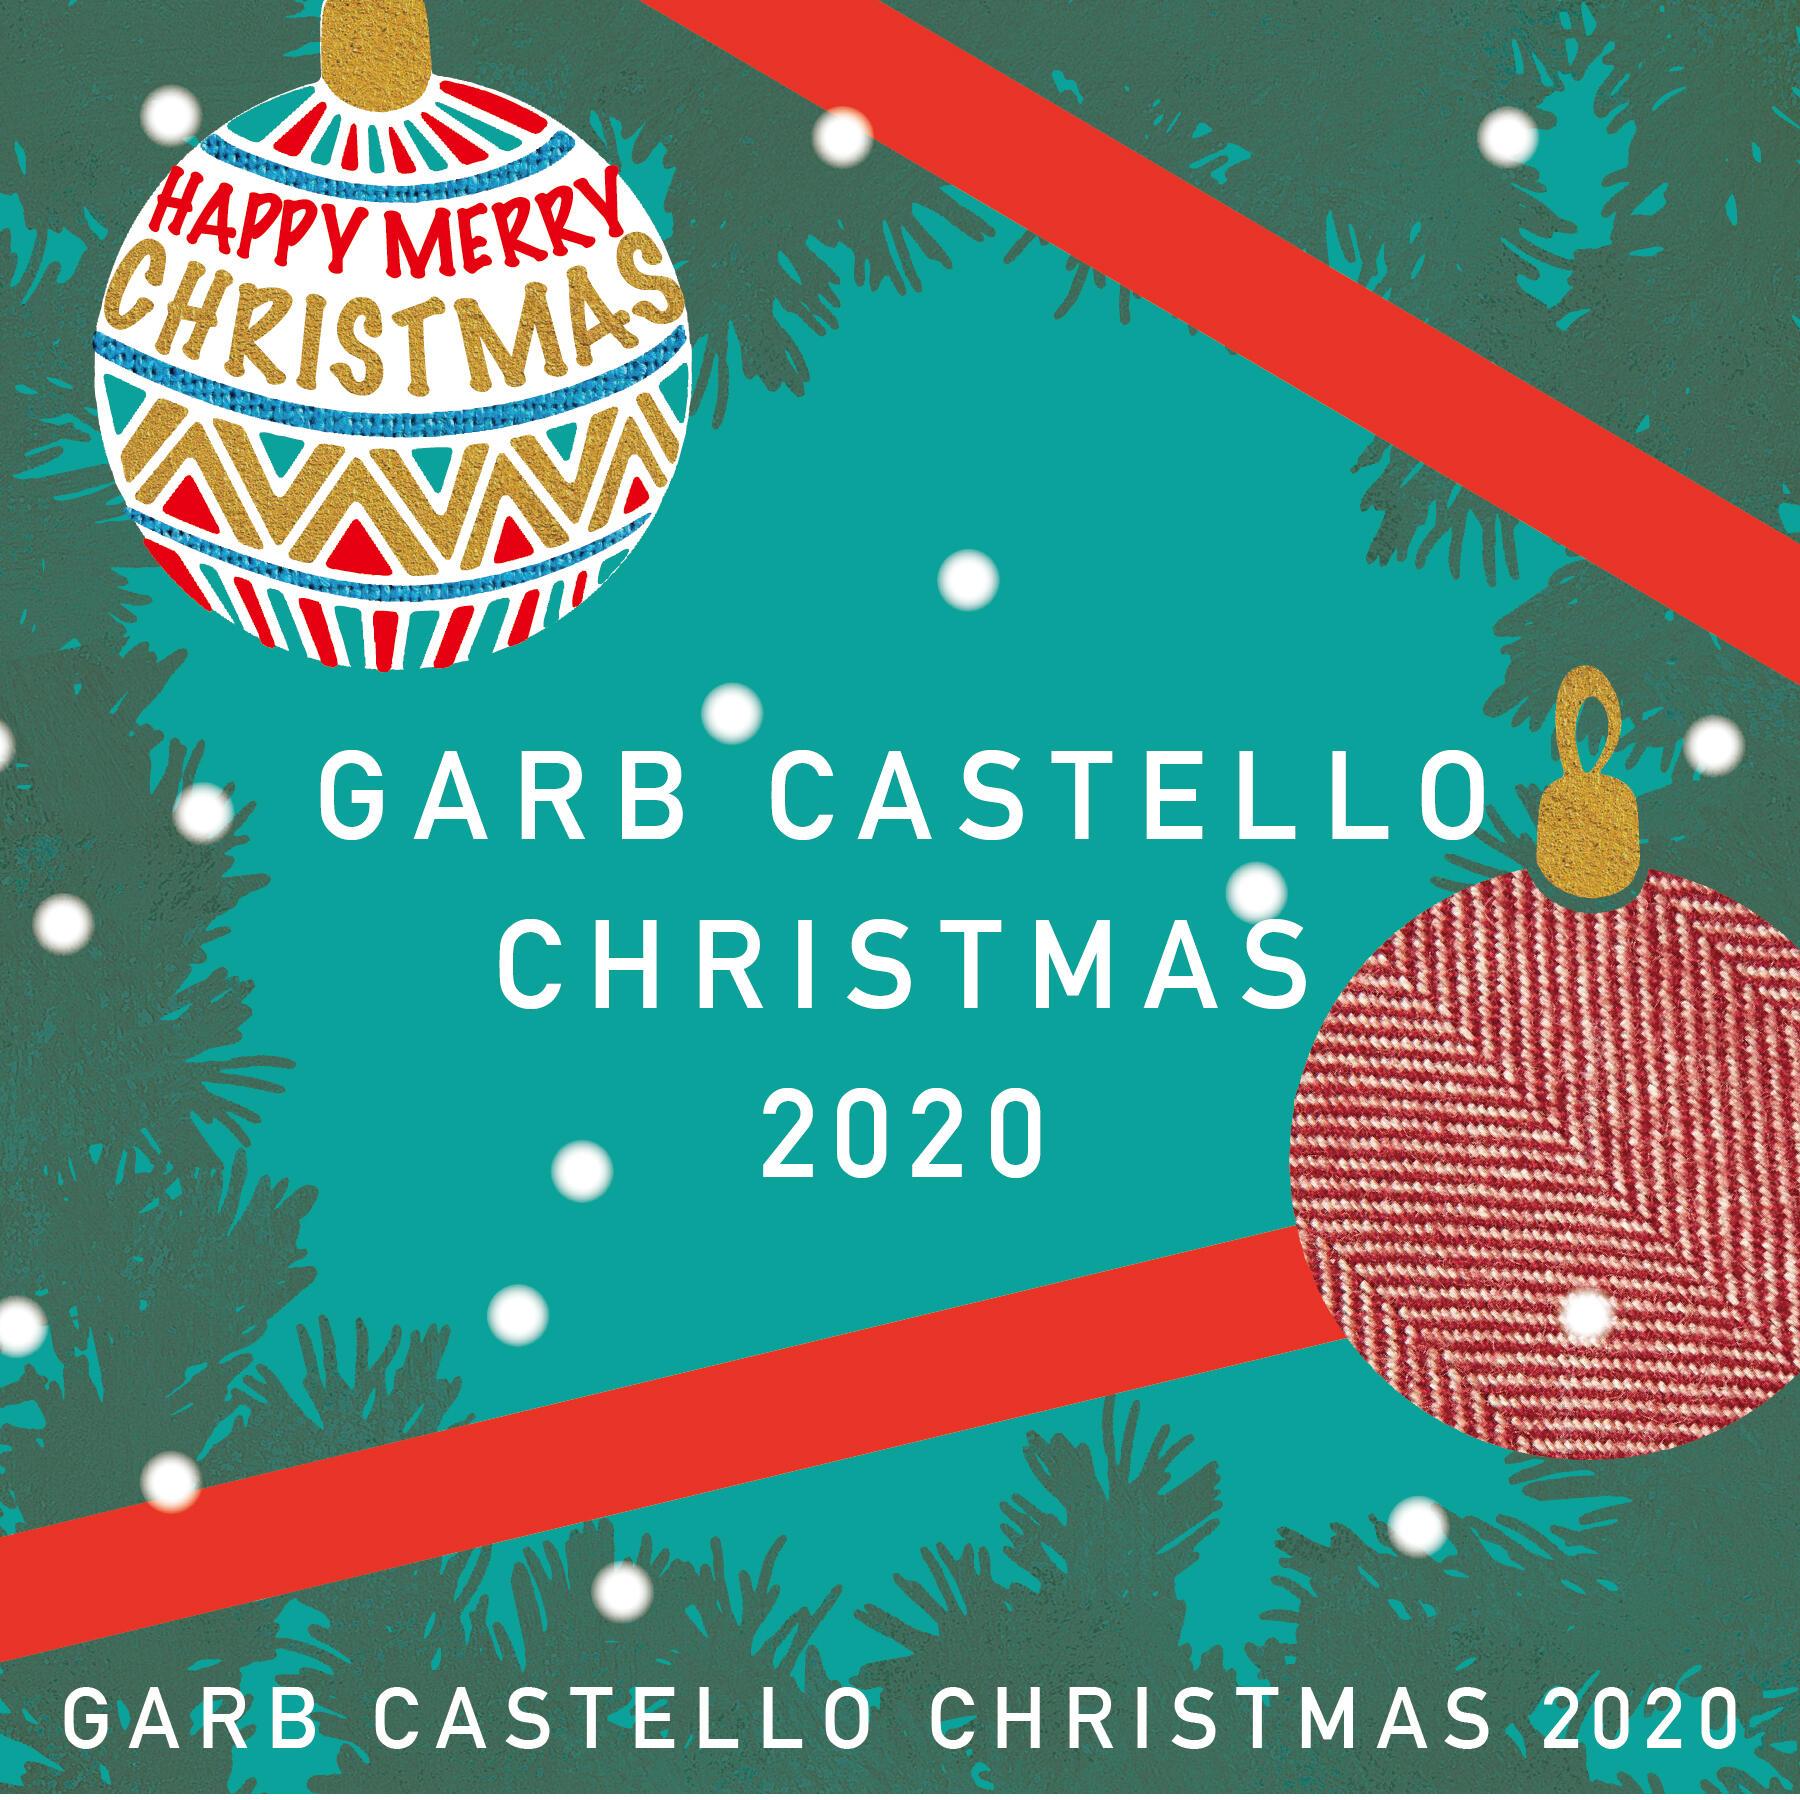 GARB CASTELLO のファミリークリスマス